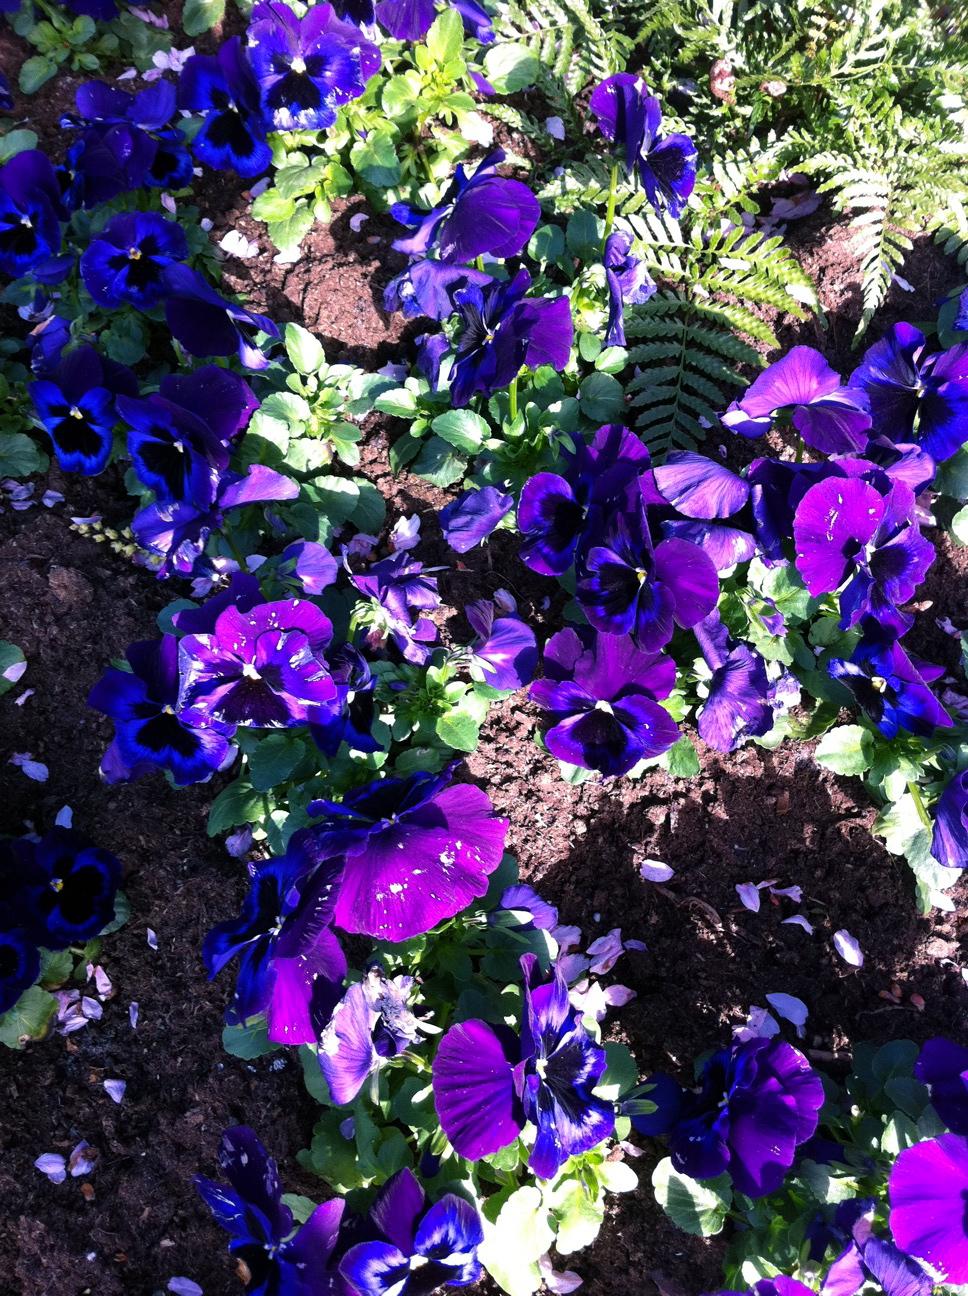 2011-04-22-photo41.jpg